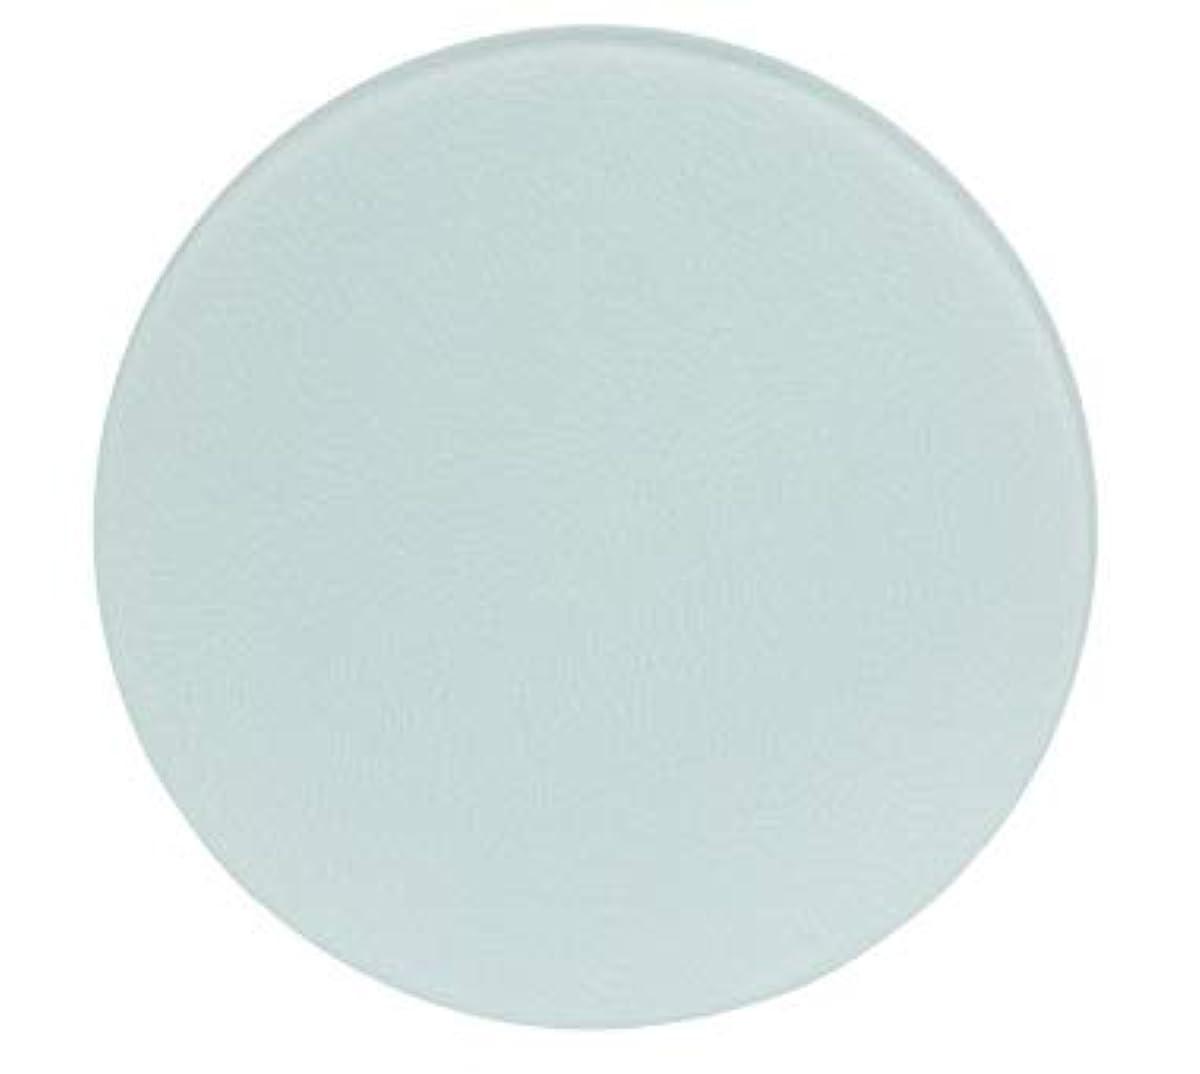 Blank Round Glass cutting board Dye Sublimation heat Transfer 2 Pcs. 20 cm 7,5''